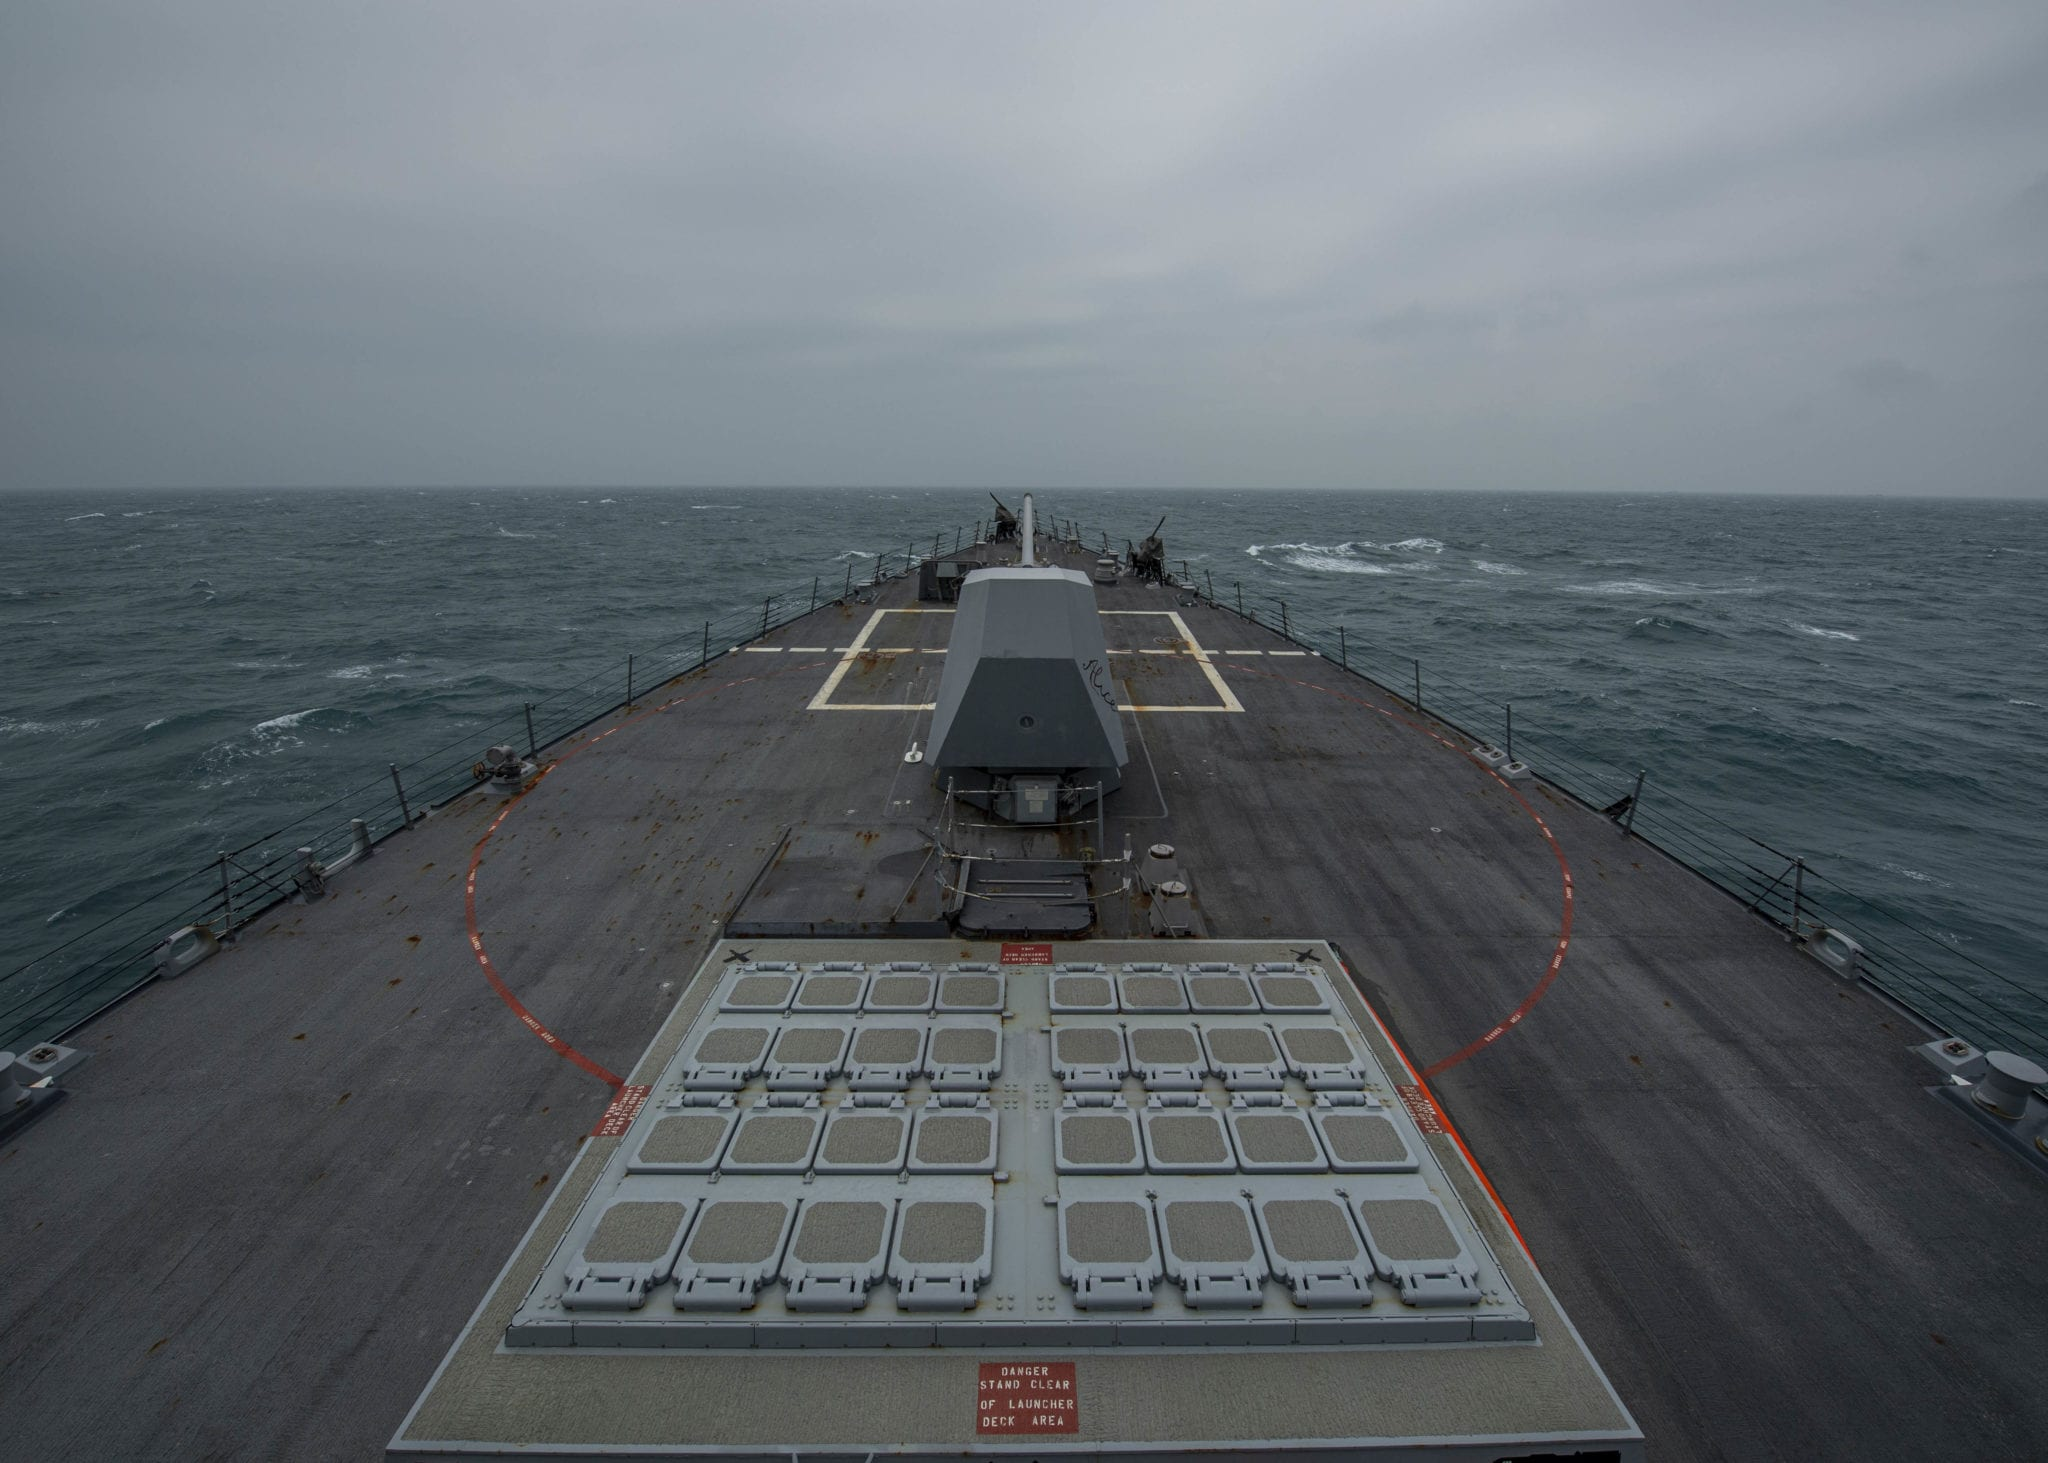 U.S. Navy Asserts Freedom to Navigate in International Waters - Seapower